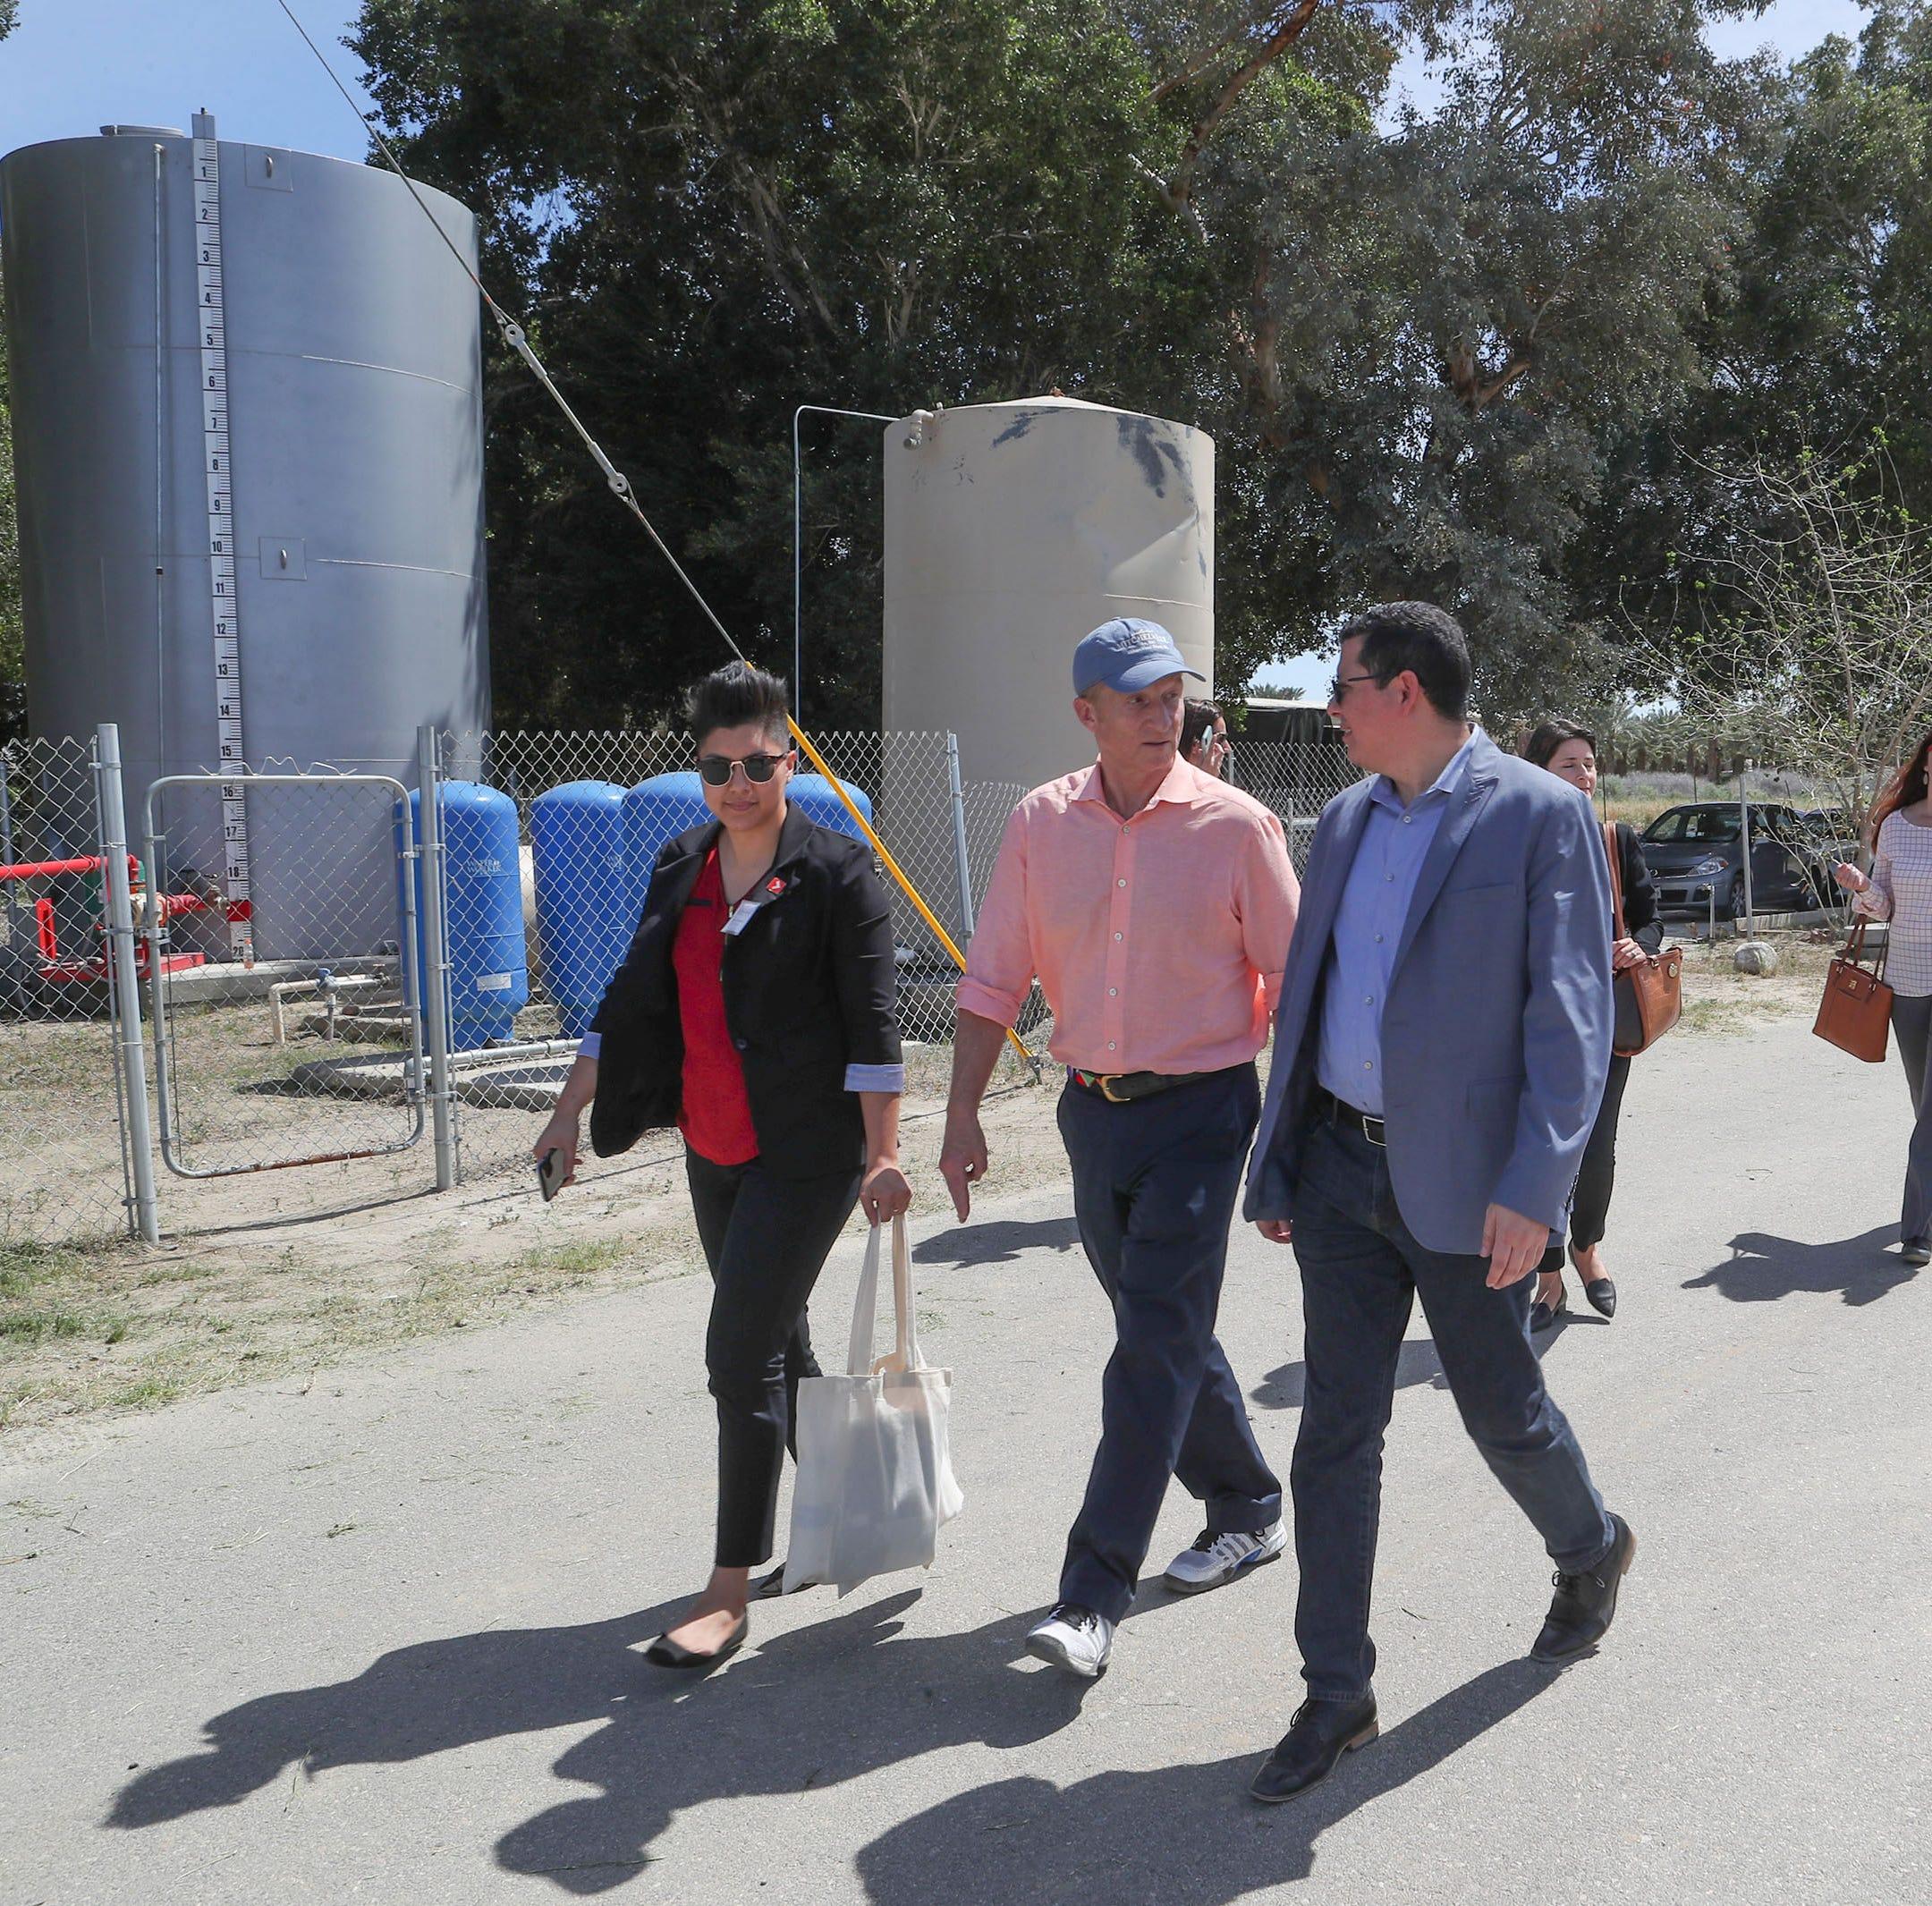 Billionaire environmentalist Tom Steyer joins Eduardo Garcia to fight for clean water across California